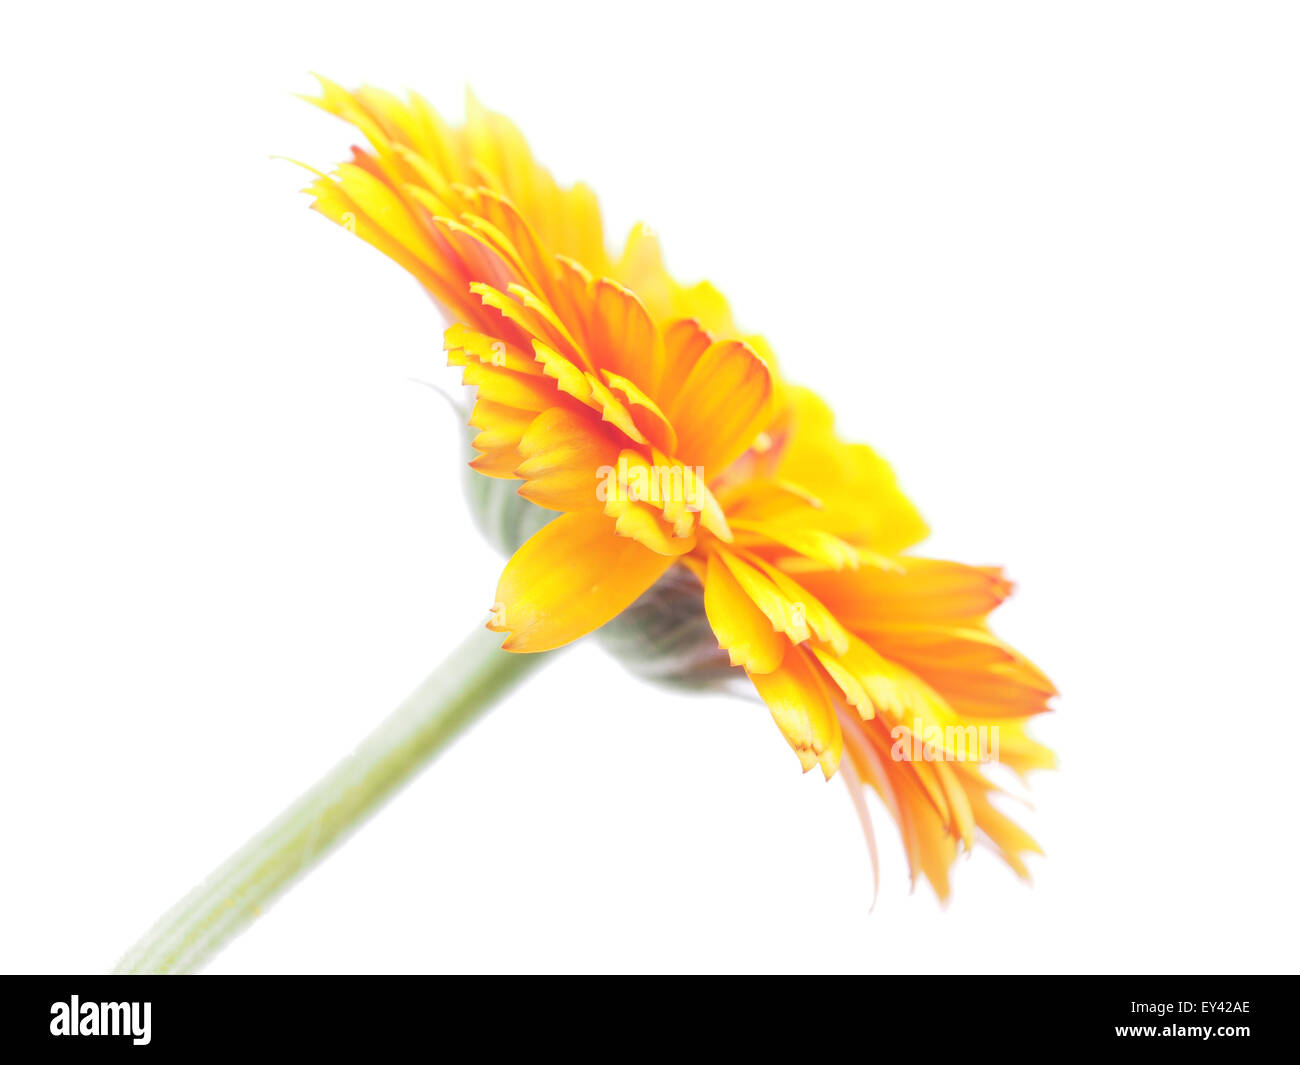 Marigold flowers on a white background stock photo 85526854 alamy marigold flowers on a white background mightylinksfo